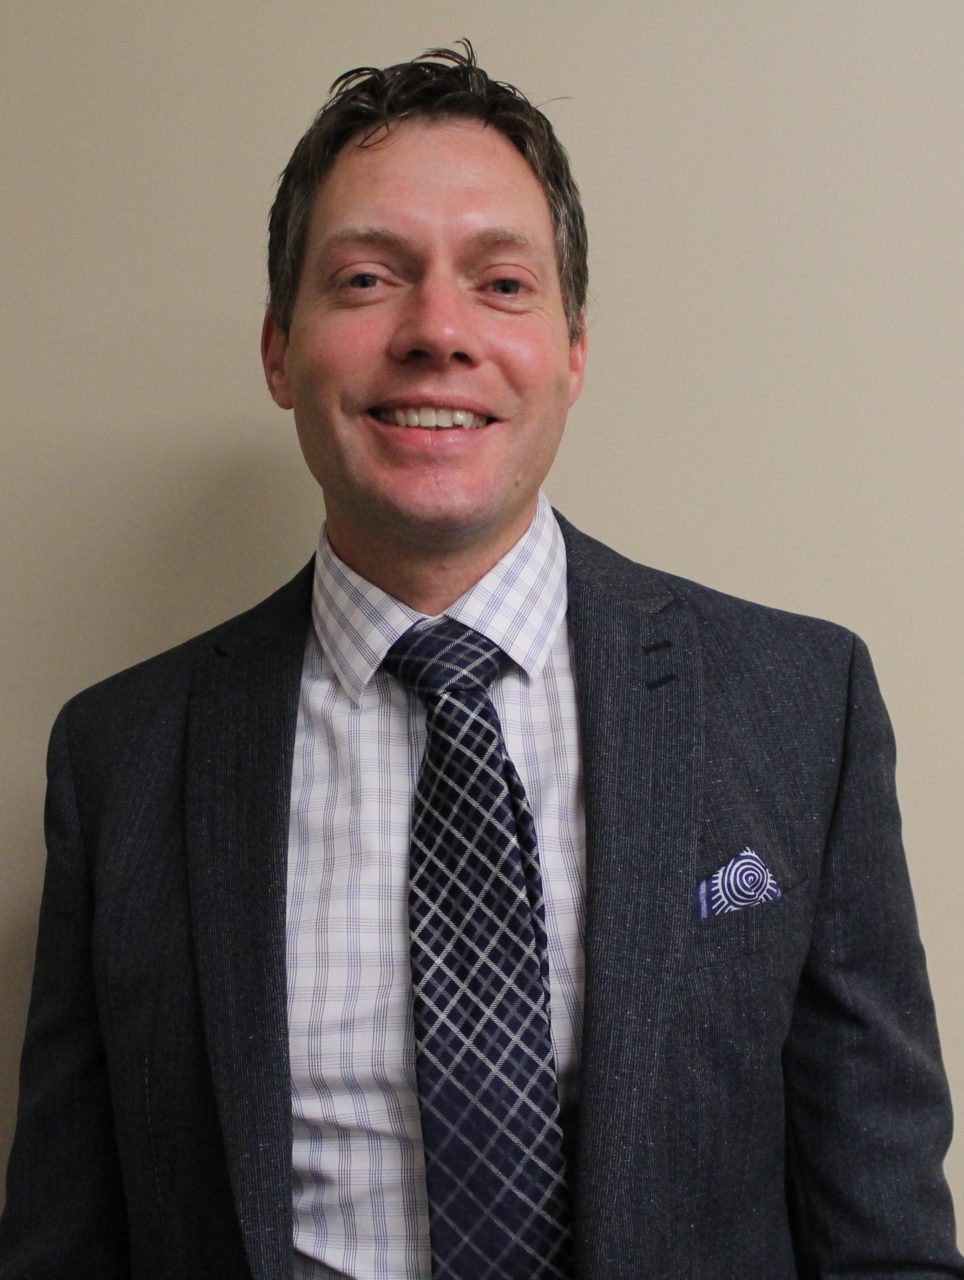 Dr. Darren Costain